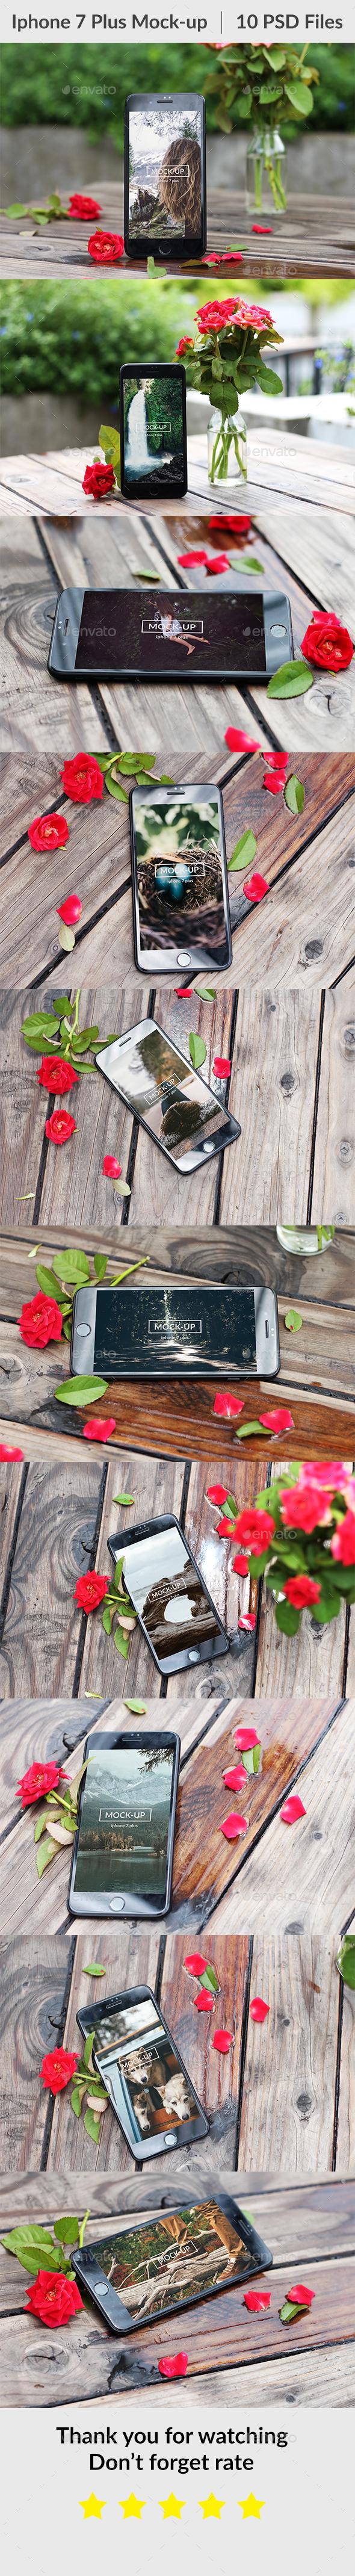 10 Phone 7 Plus Mockup - Mobile Displays